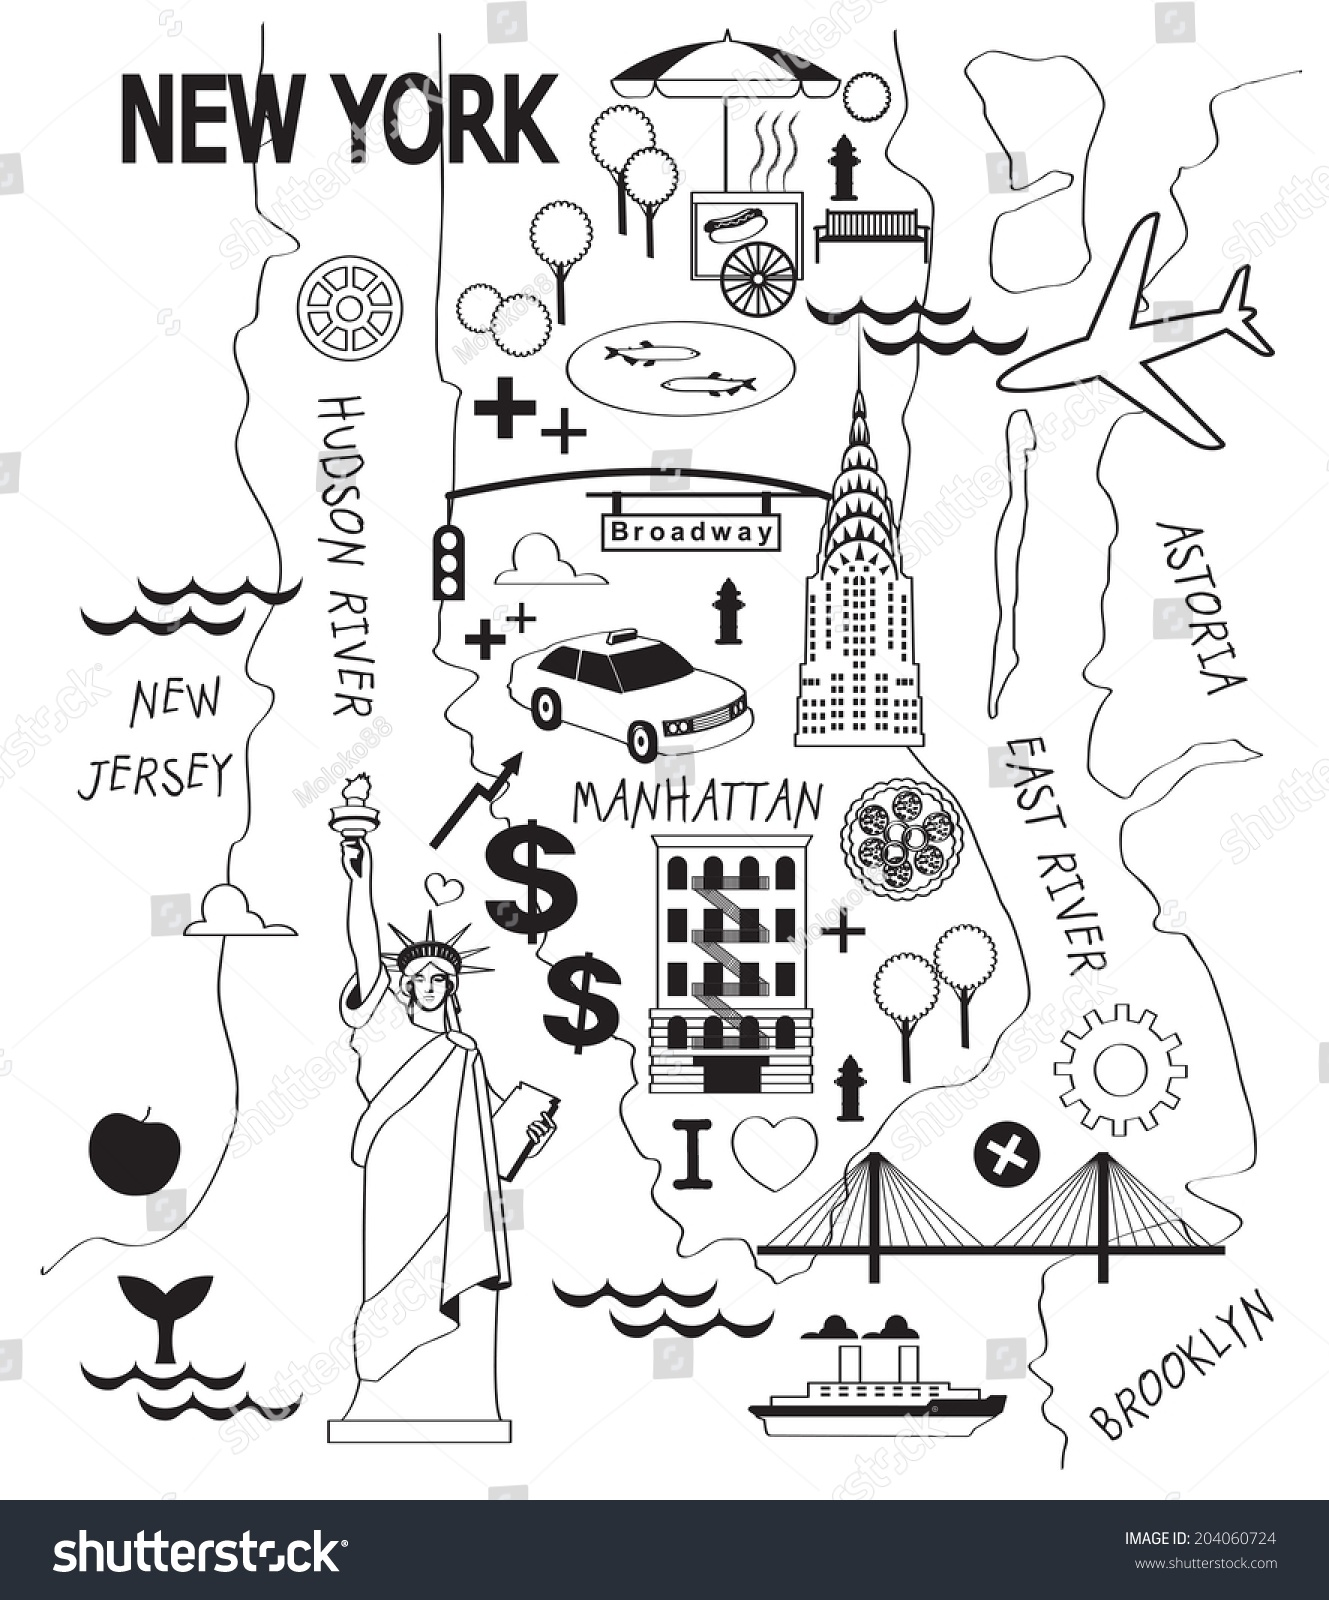 Cartoon Map Of New York City.Cartoon Map New York City Stock Vector Royalty Free 204060724